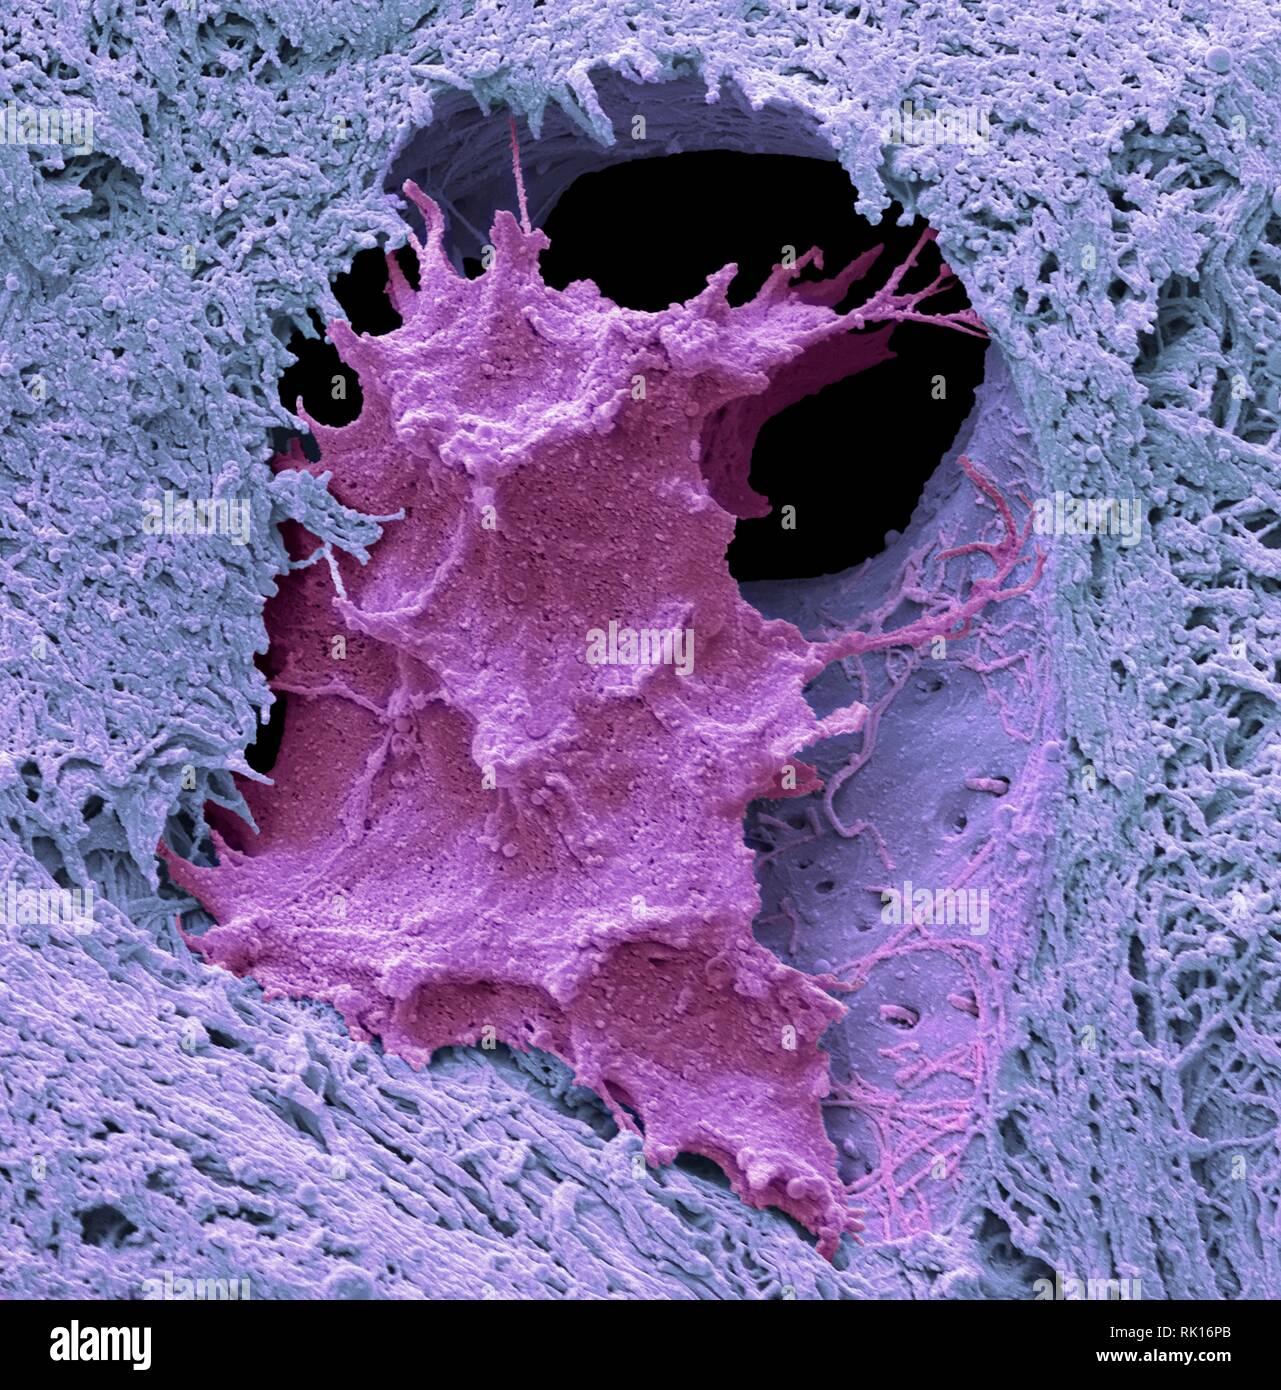 Osteocyte bone cell, SEM - Stock Image